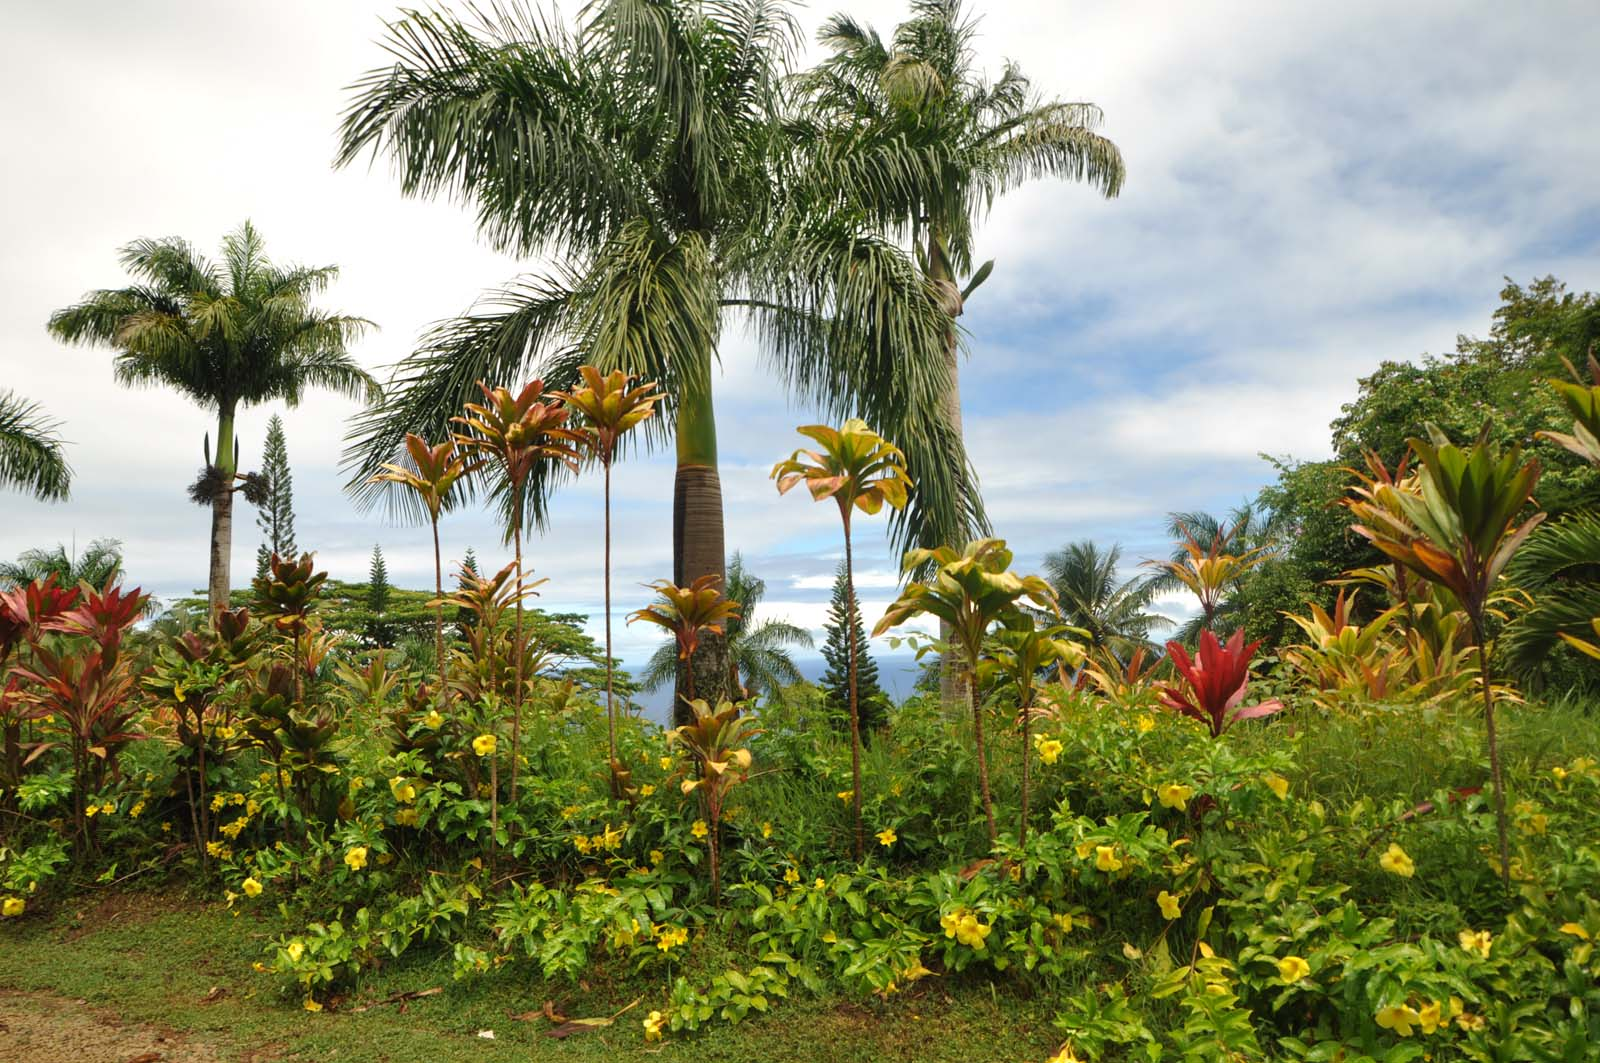 081_maui_hawaii_island